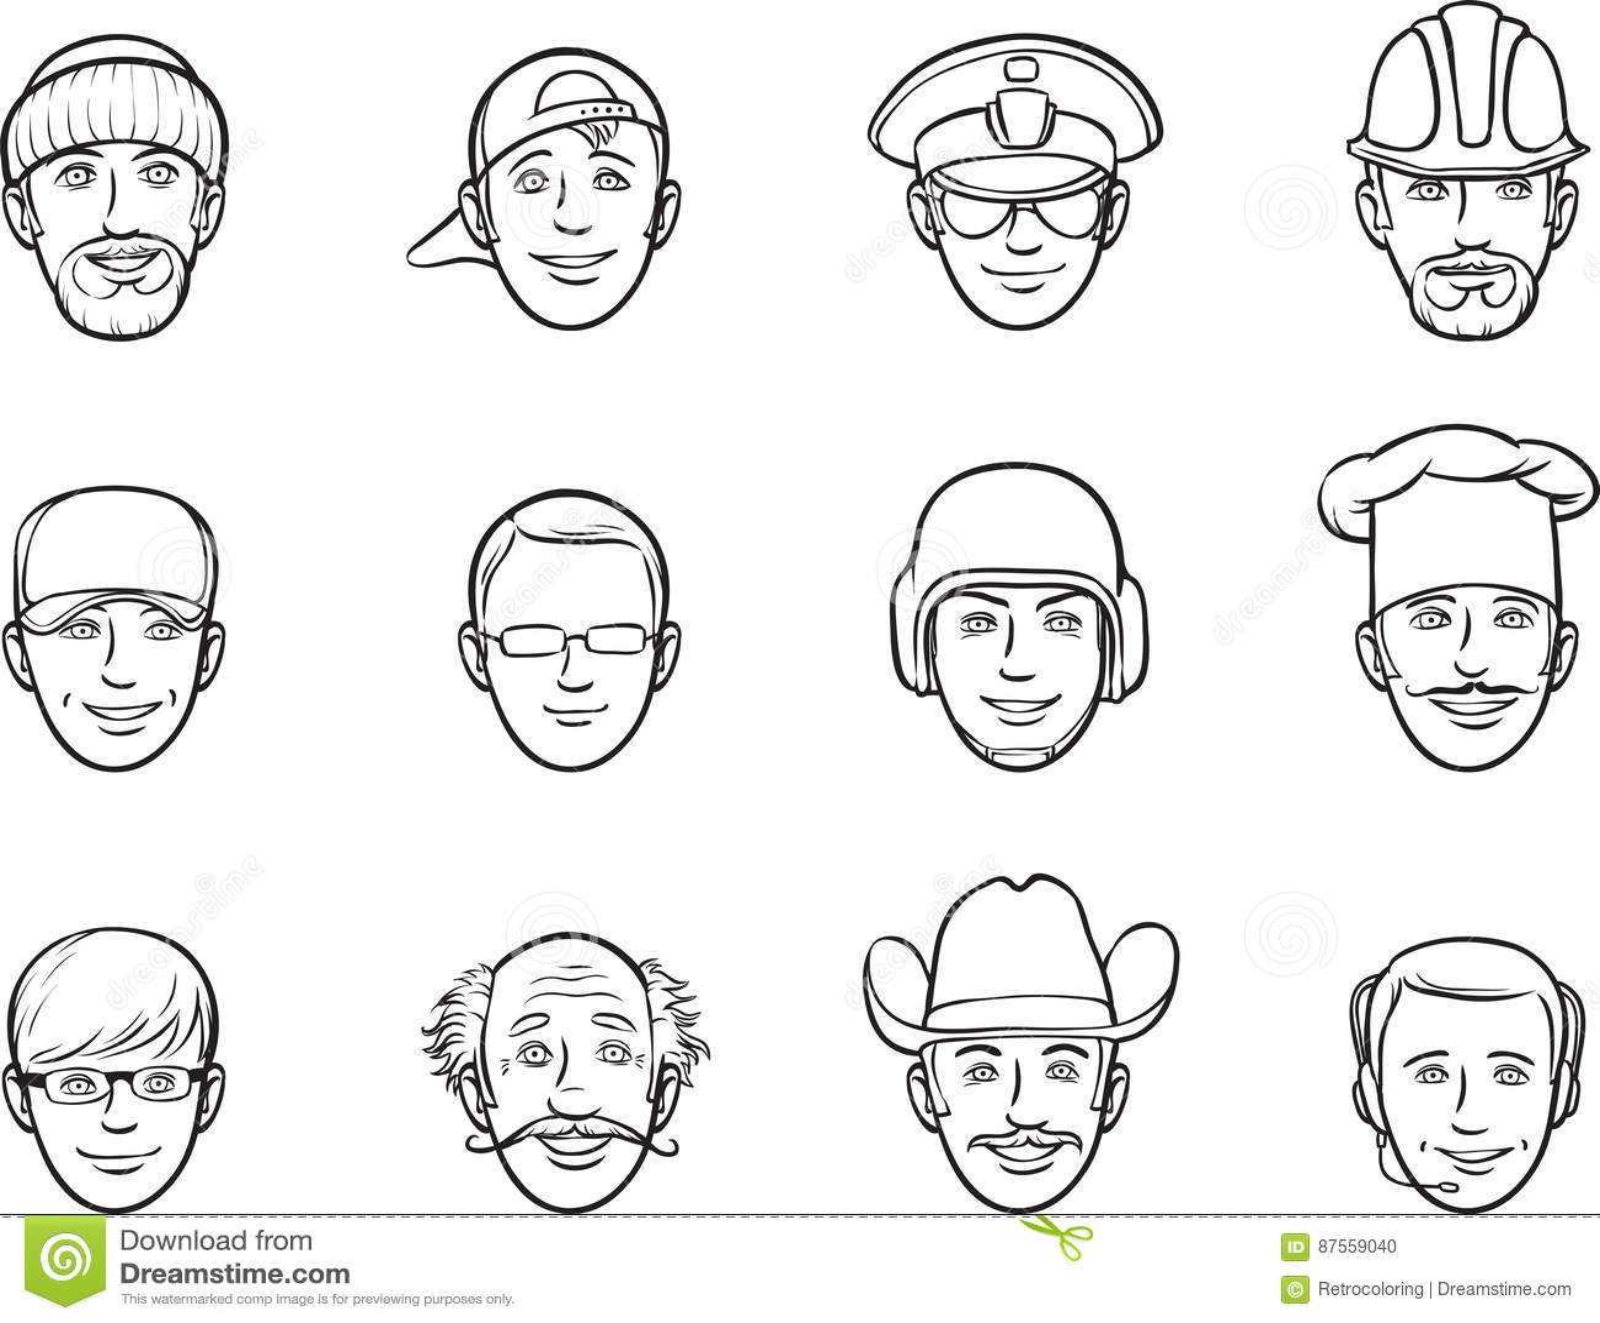 Dibujo De Whiteboard - El Avatar De La Historieta Hace Frente A ...